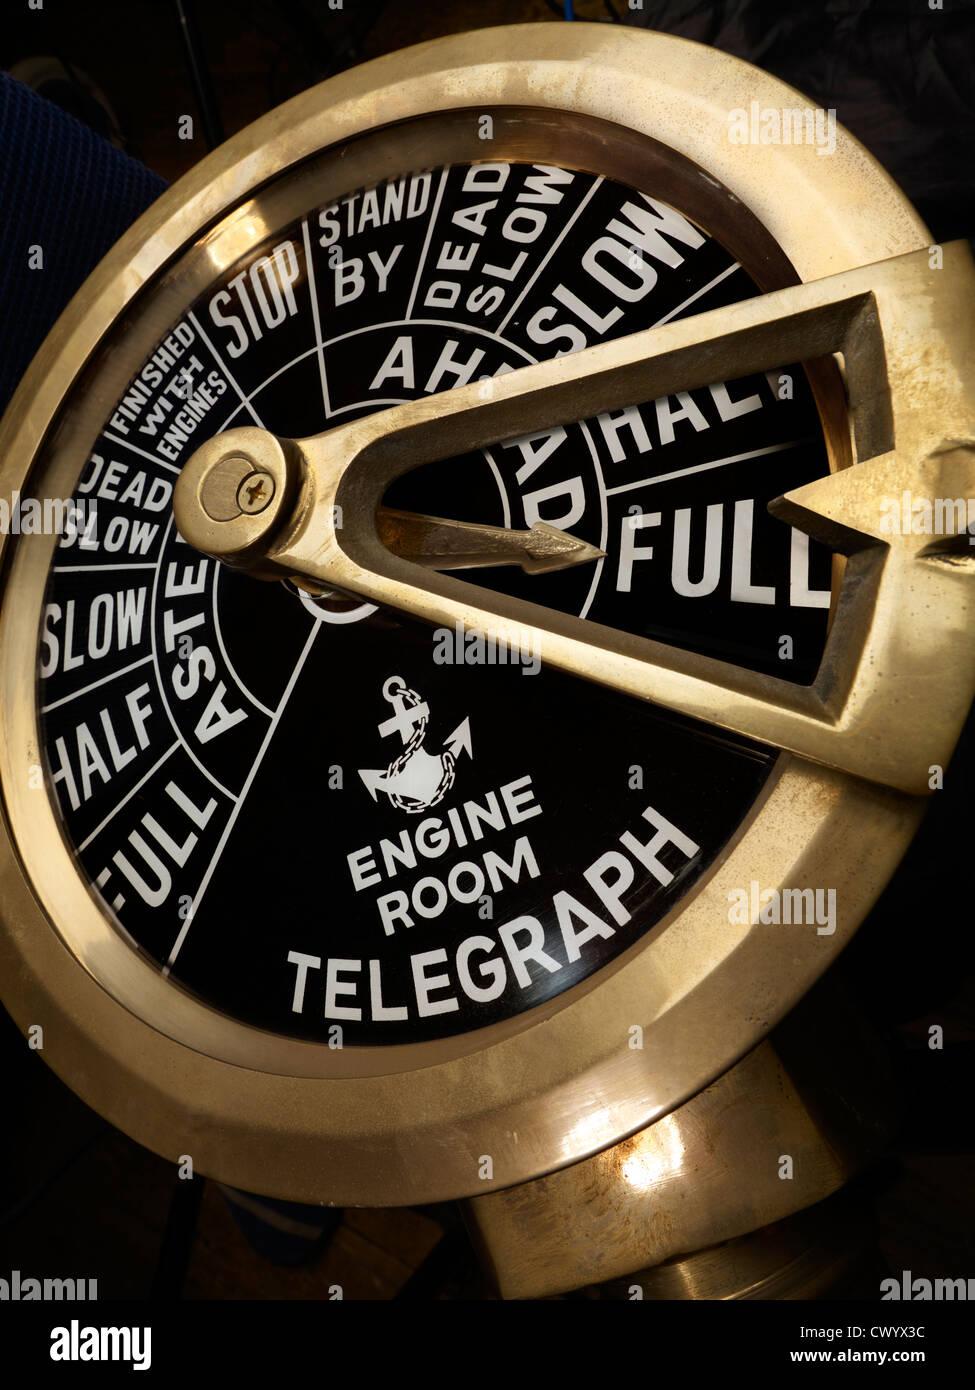 Steam Ship Engine Room: Full Steam Ahead, A Brass Ship's Telegraph In The Full